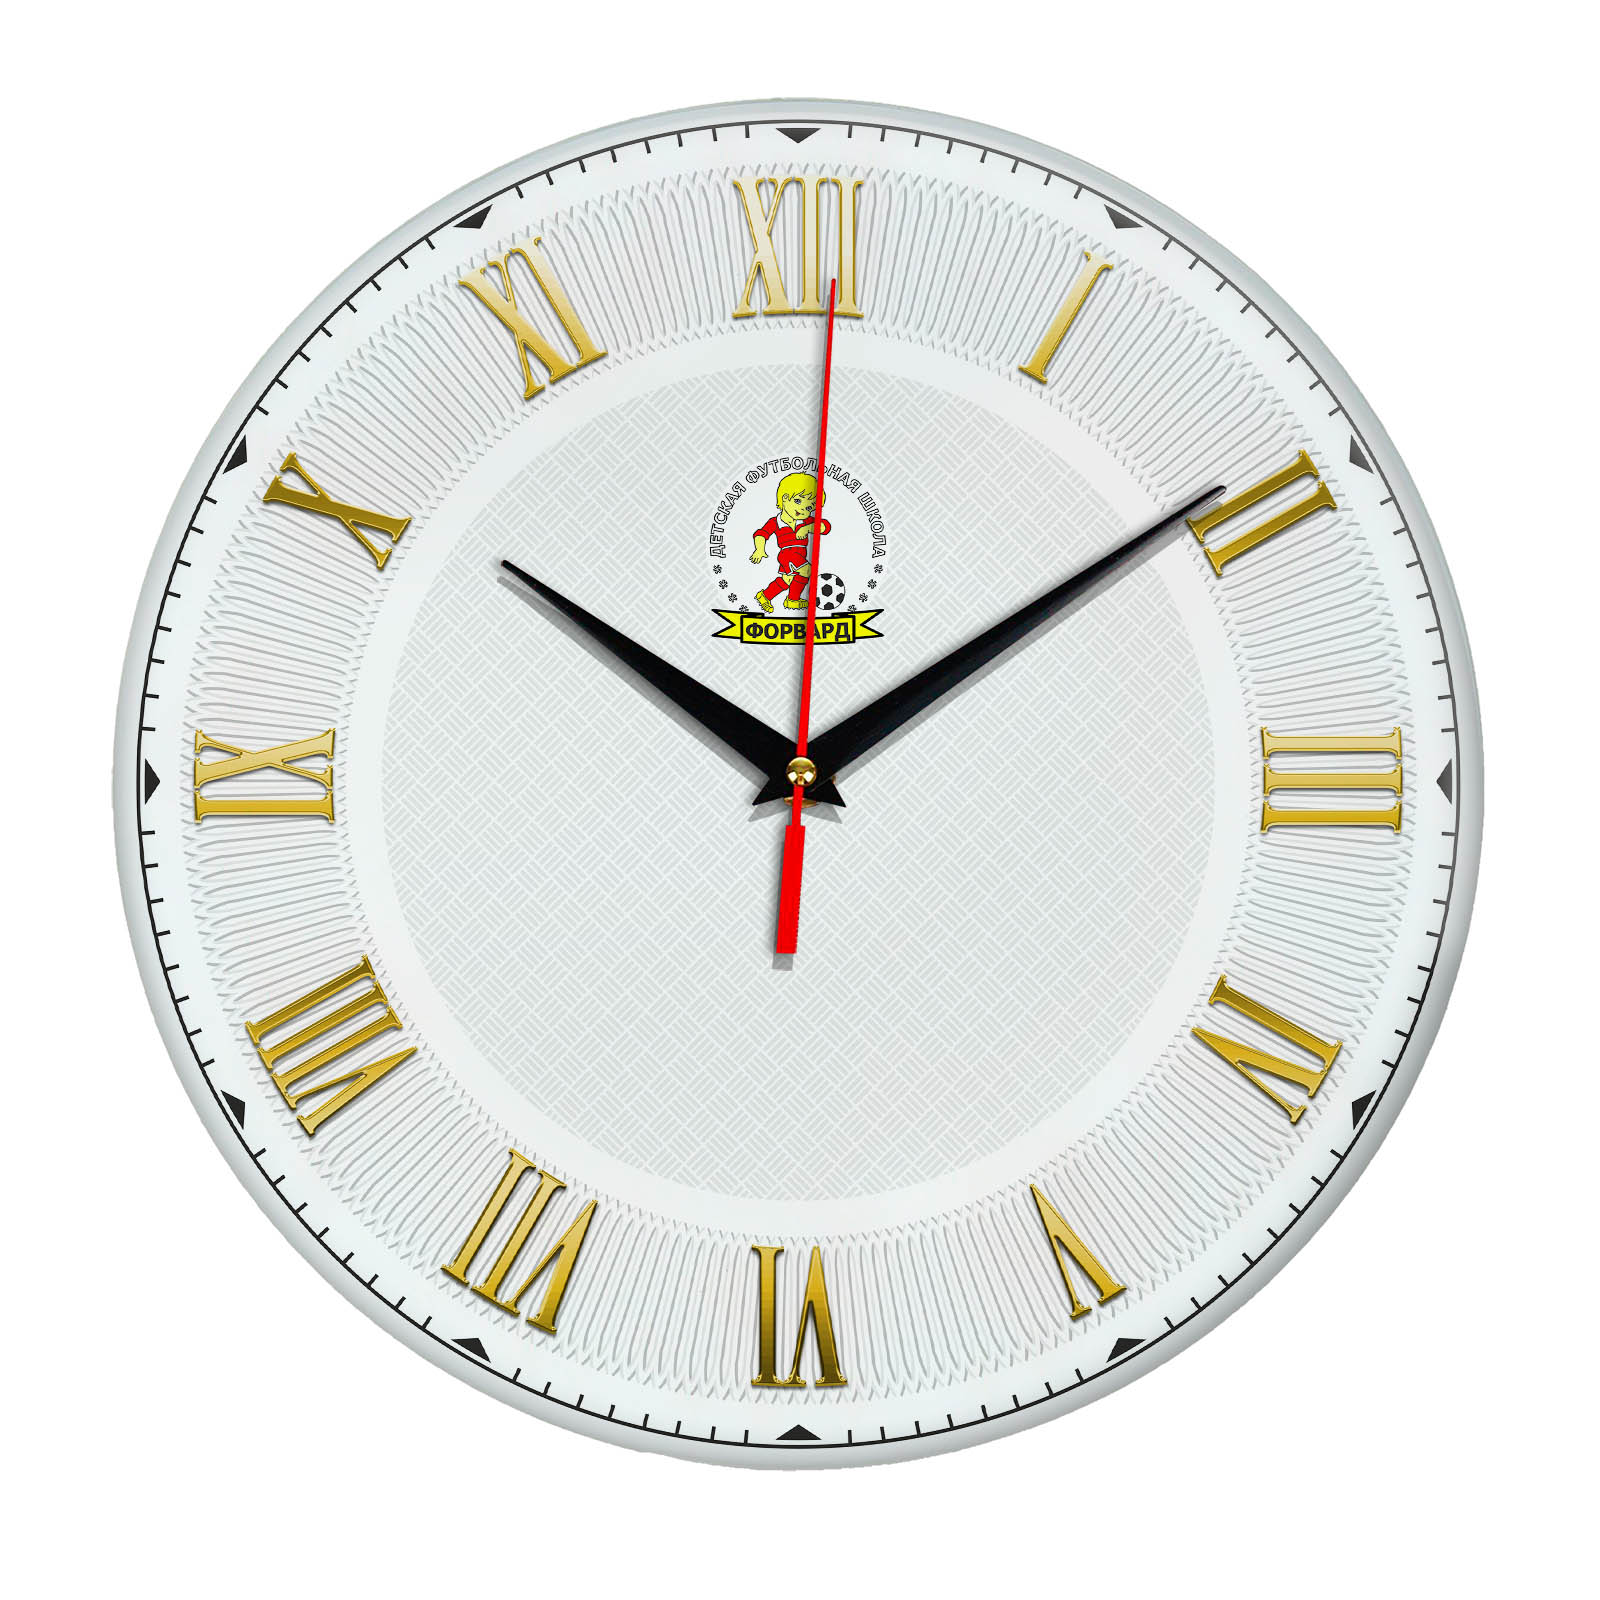 Настенные часы «Футбольный клуб DFSH FORVARD»